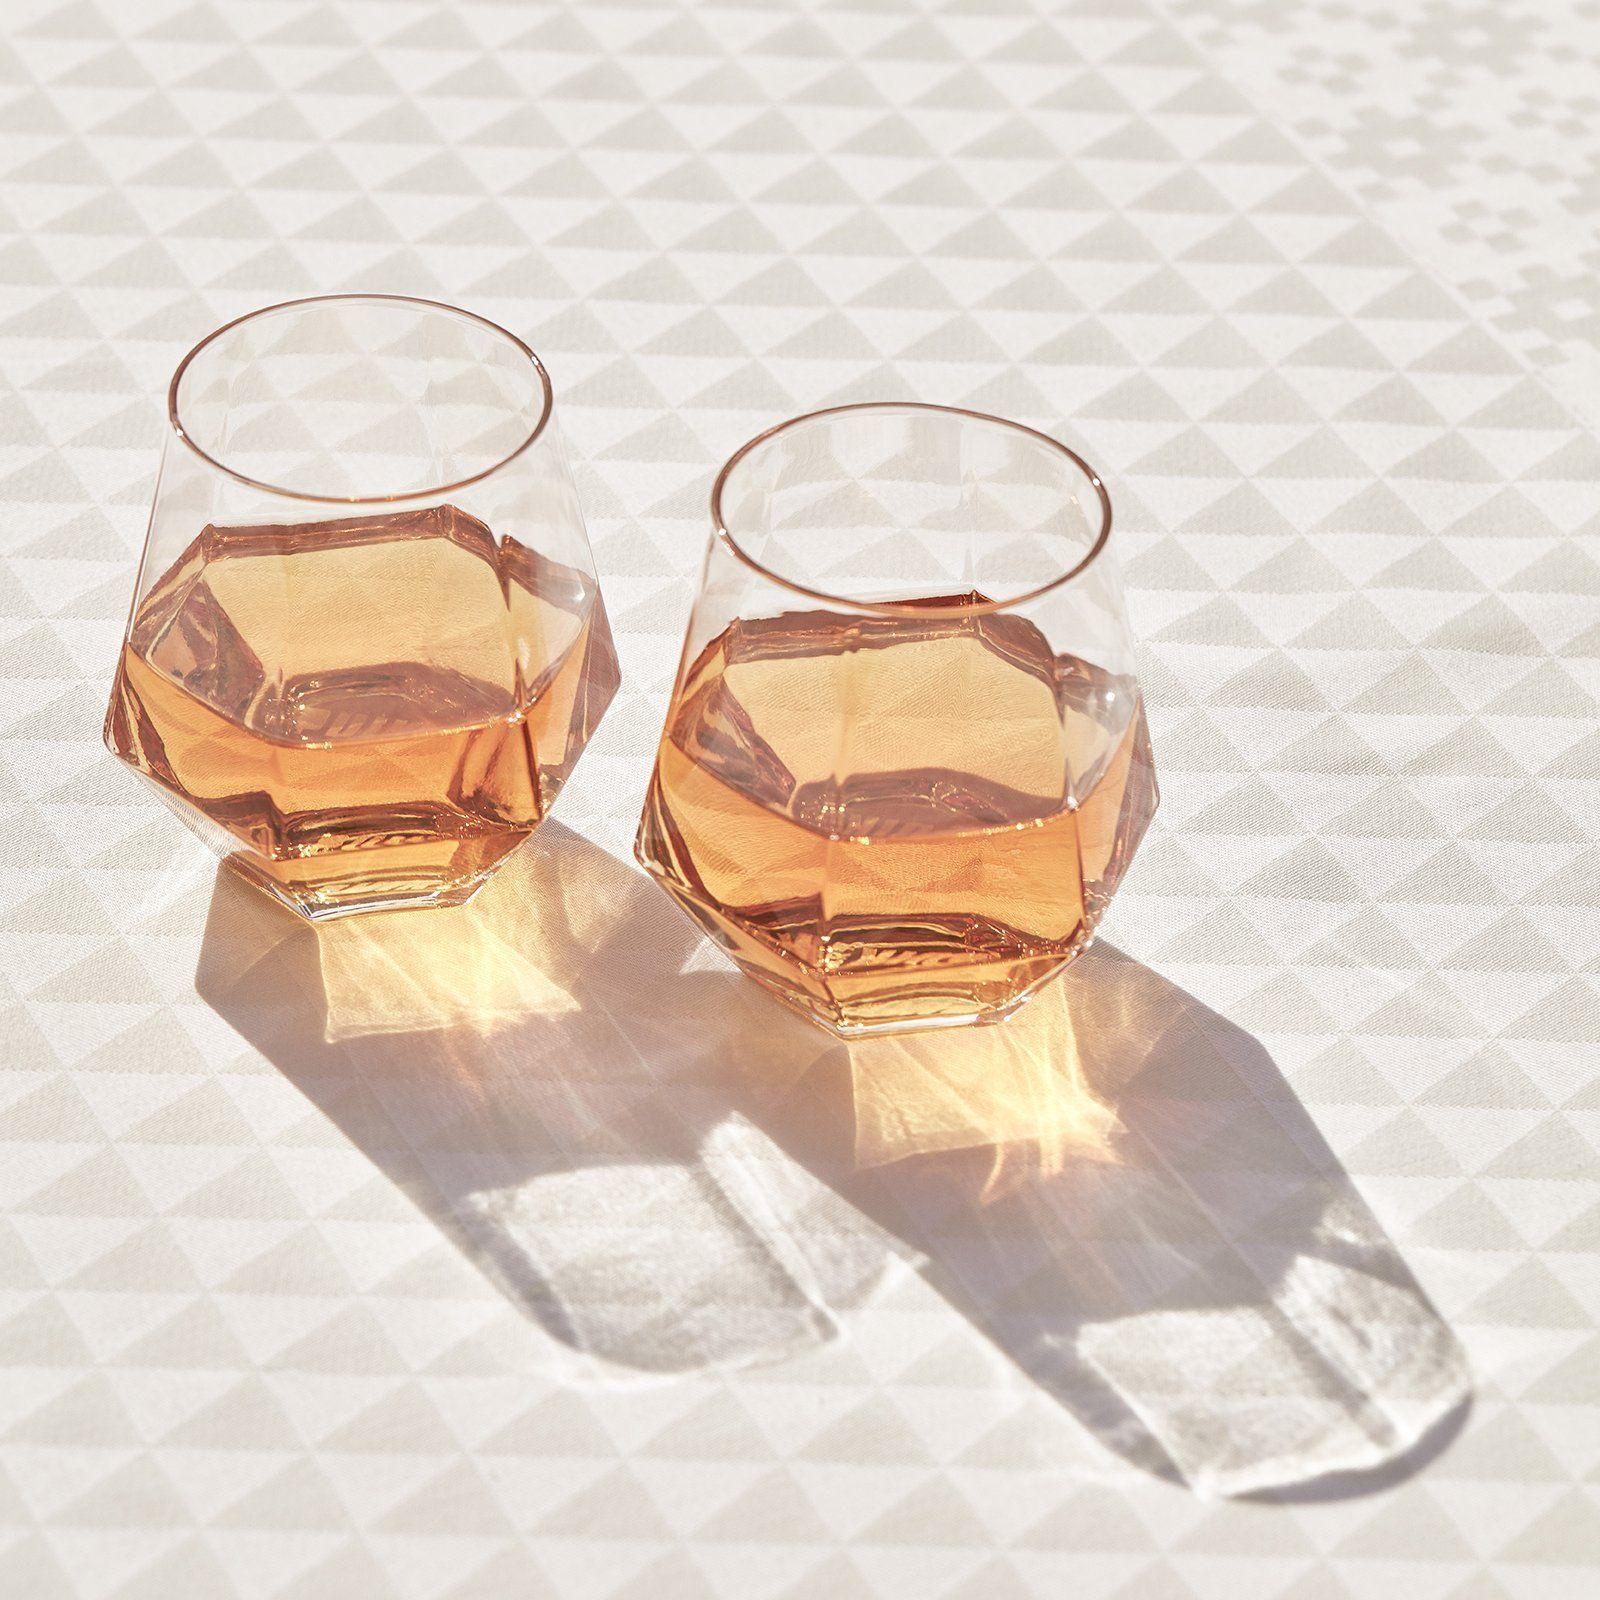 Radiant Crystal Water Glasses 97601516912993041 Crystal Glass Set Glass Set Glassware